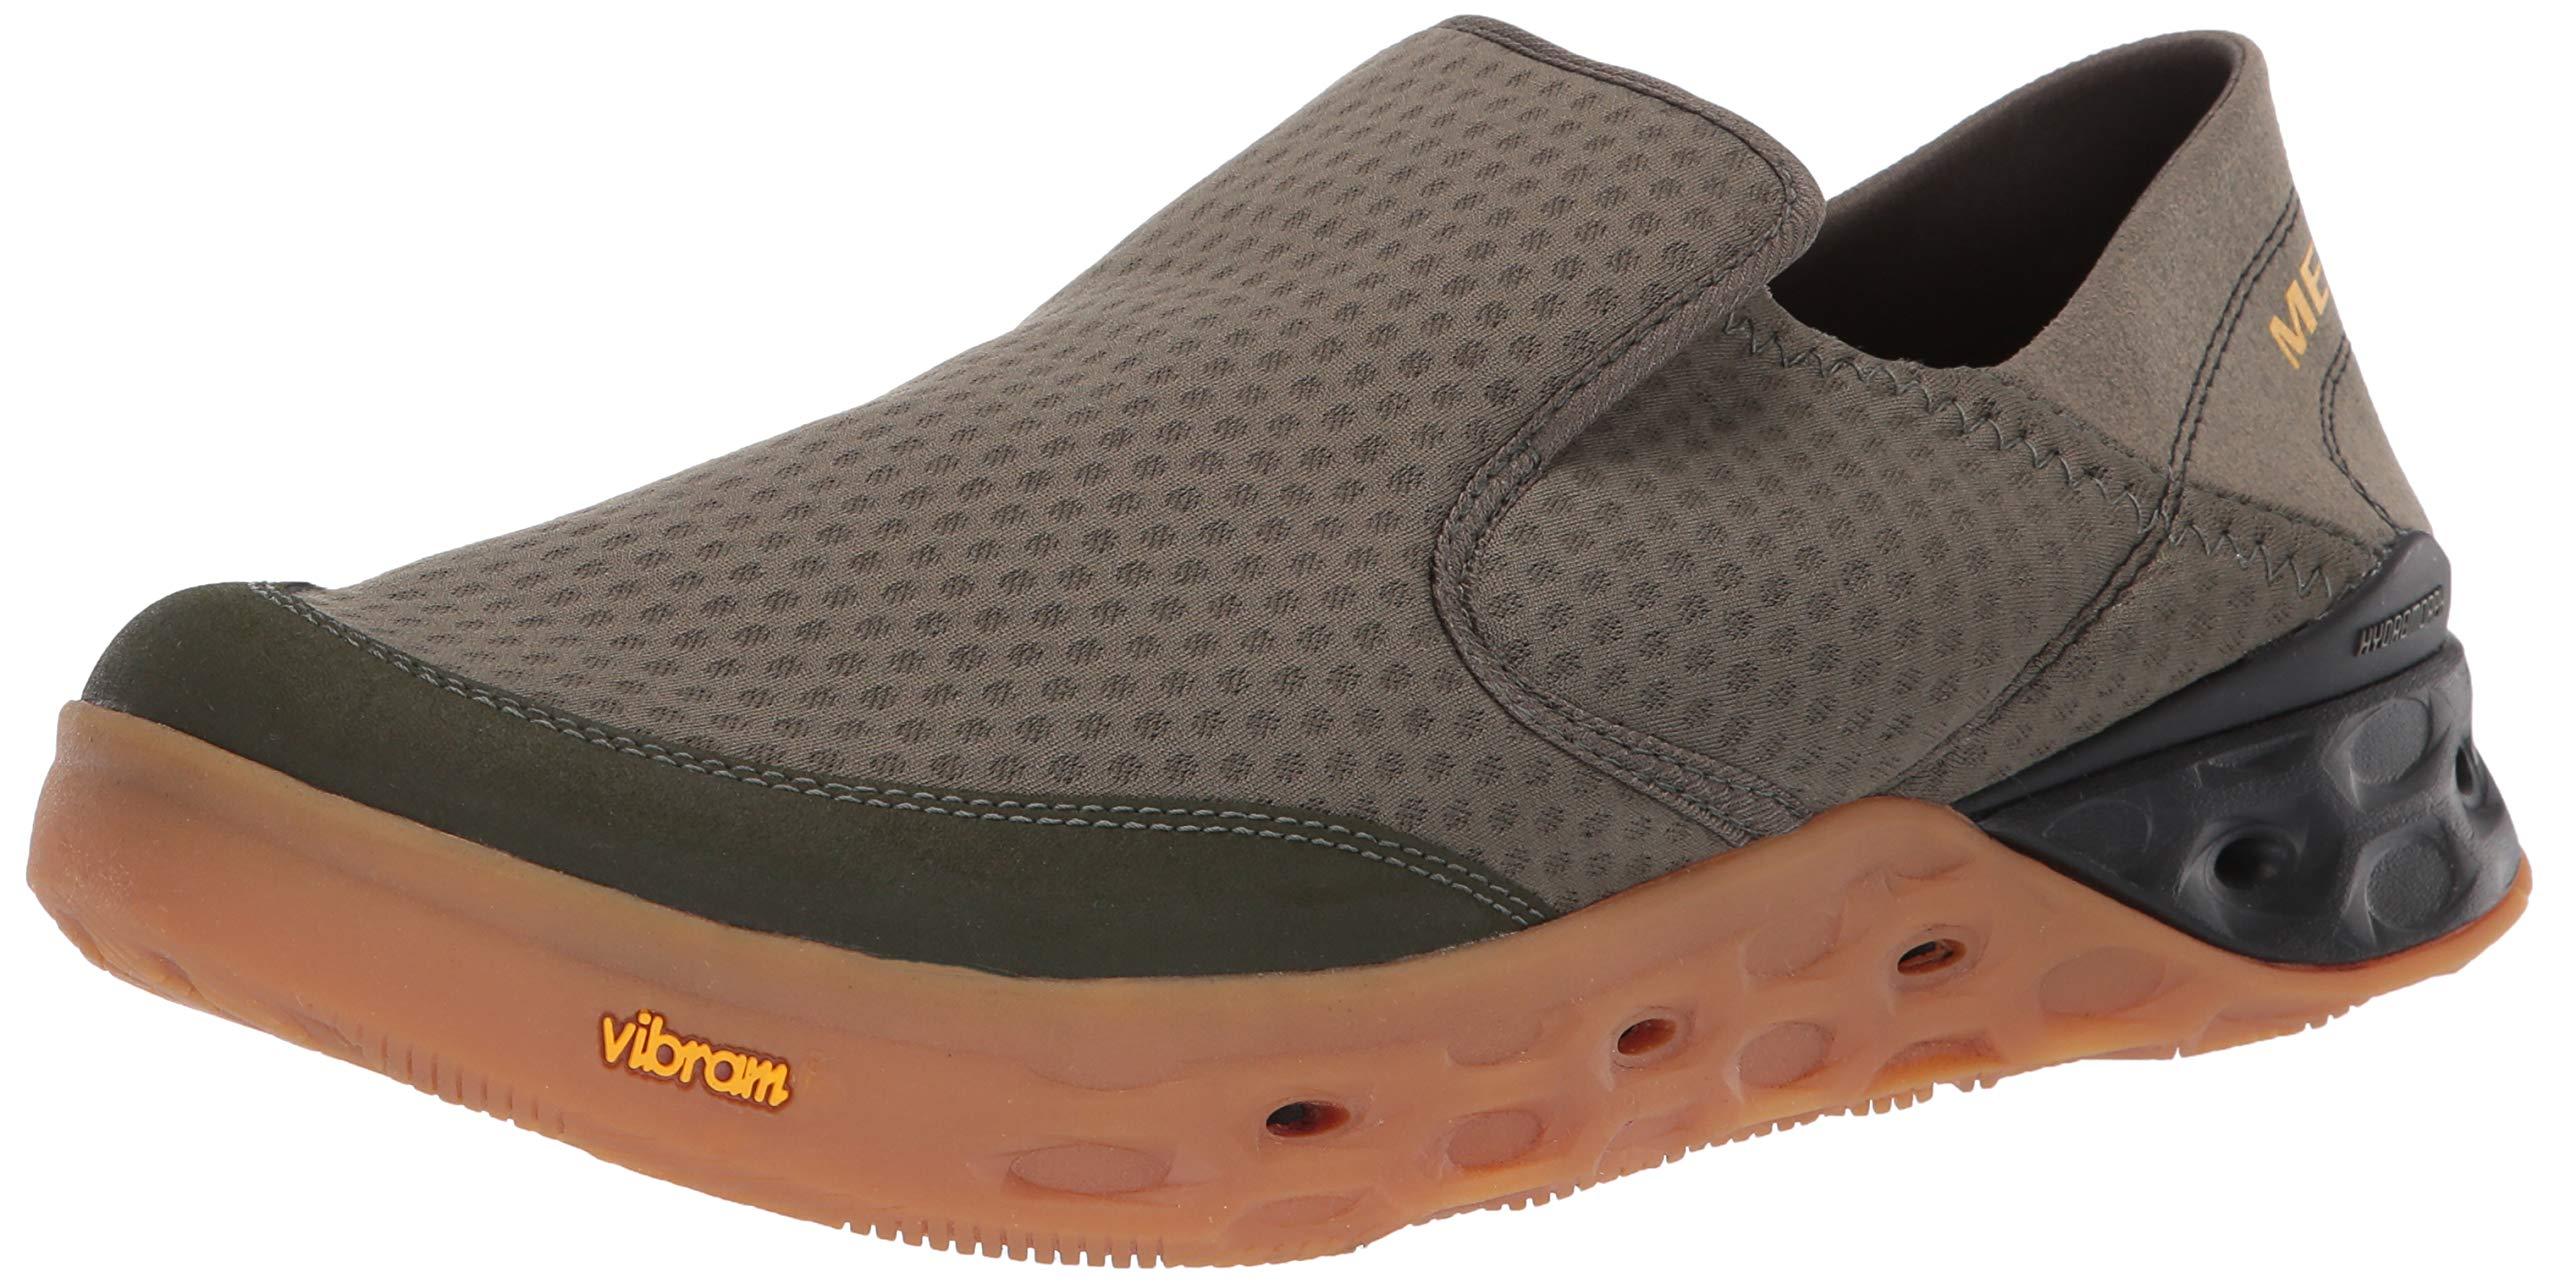 Merrell Men's TIDERISER MOC Water Shoe, Olive, 12.0 M US